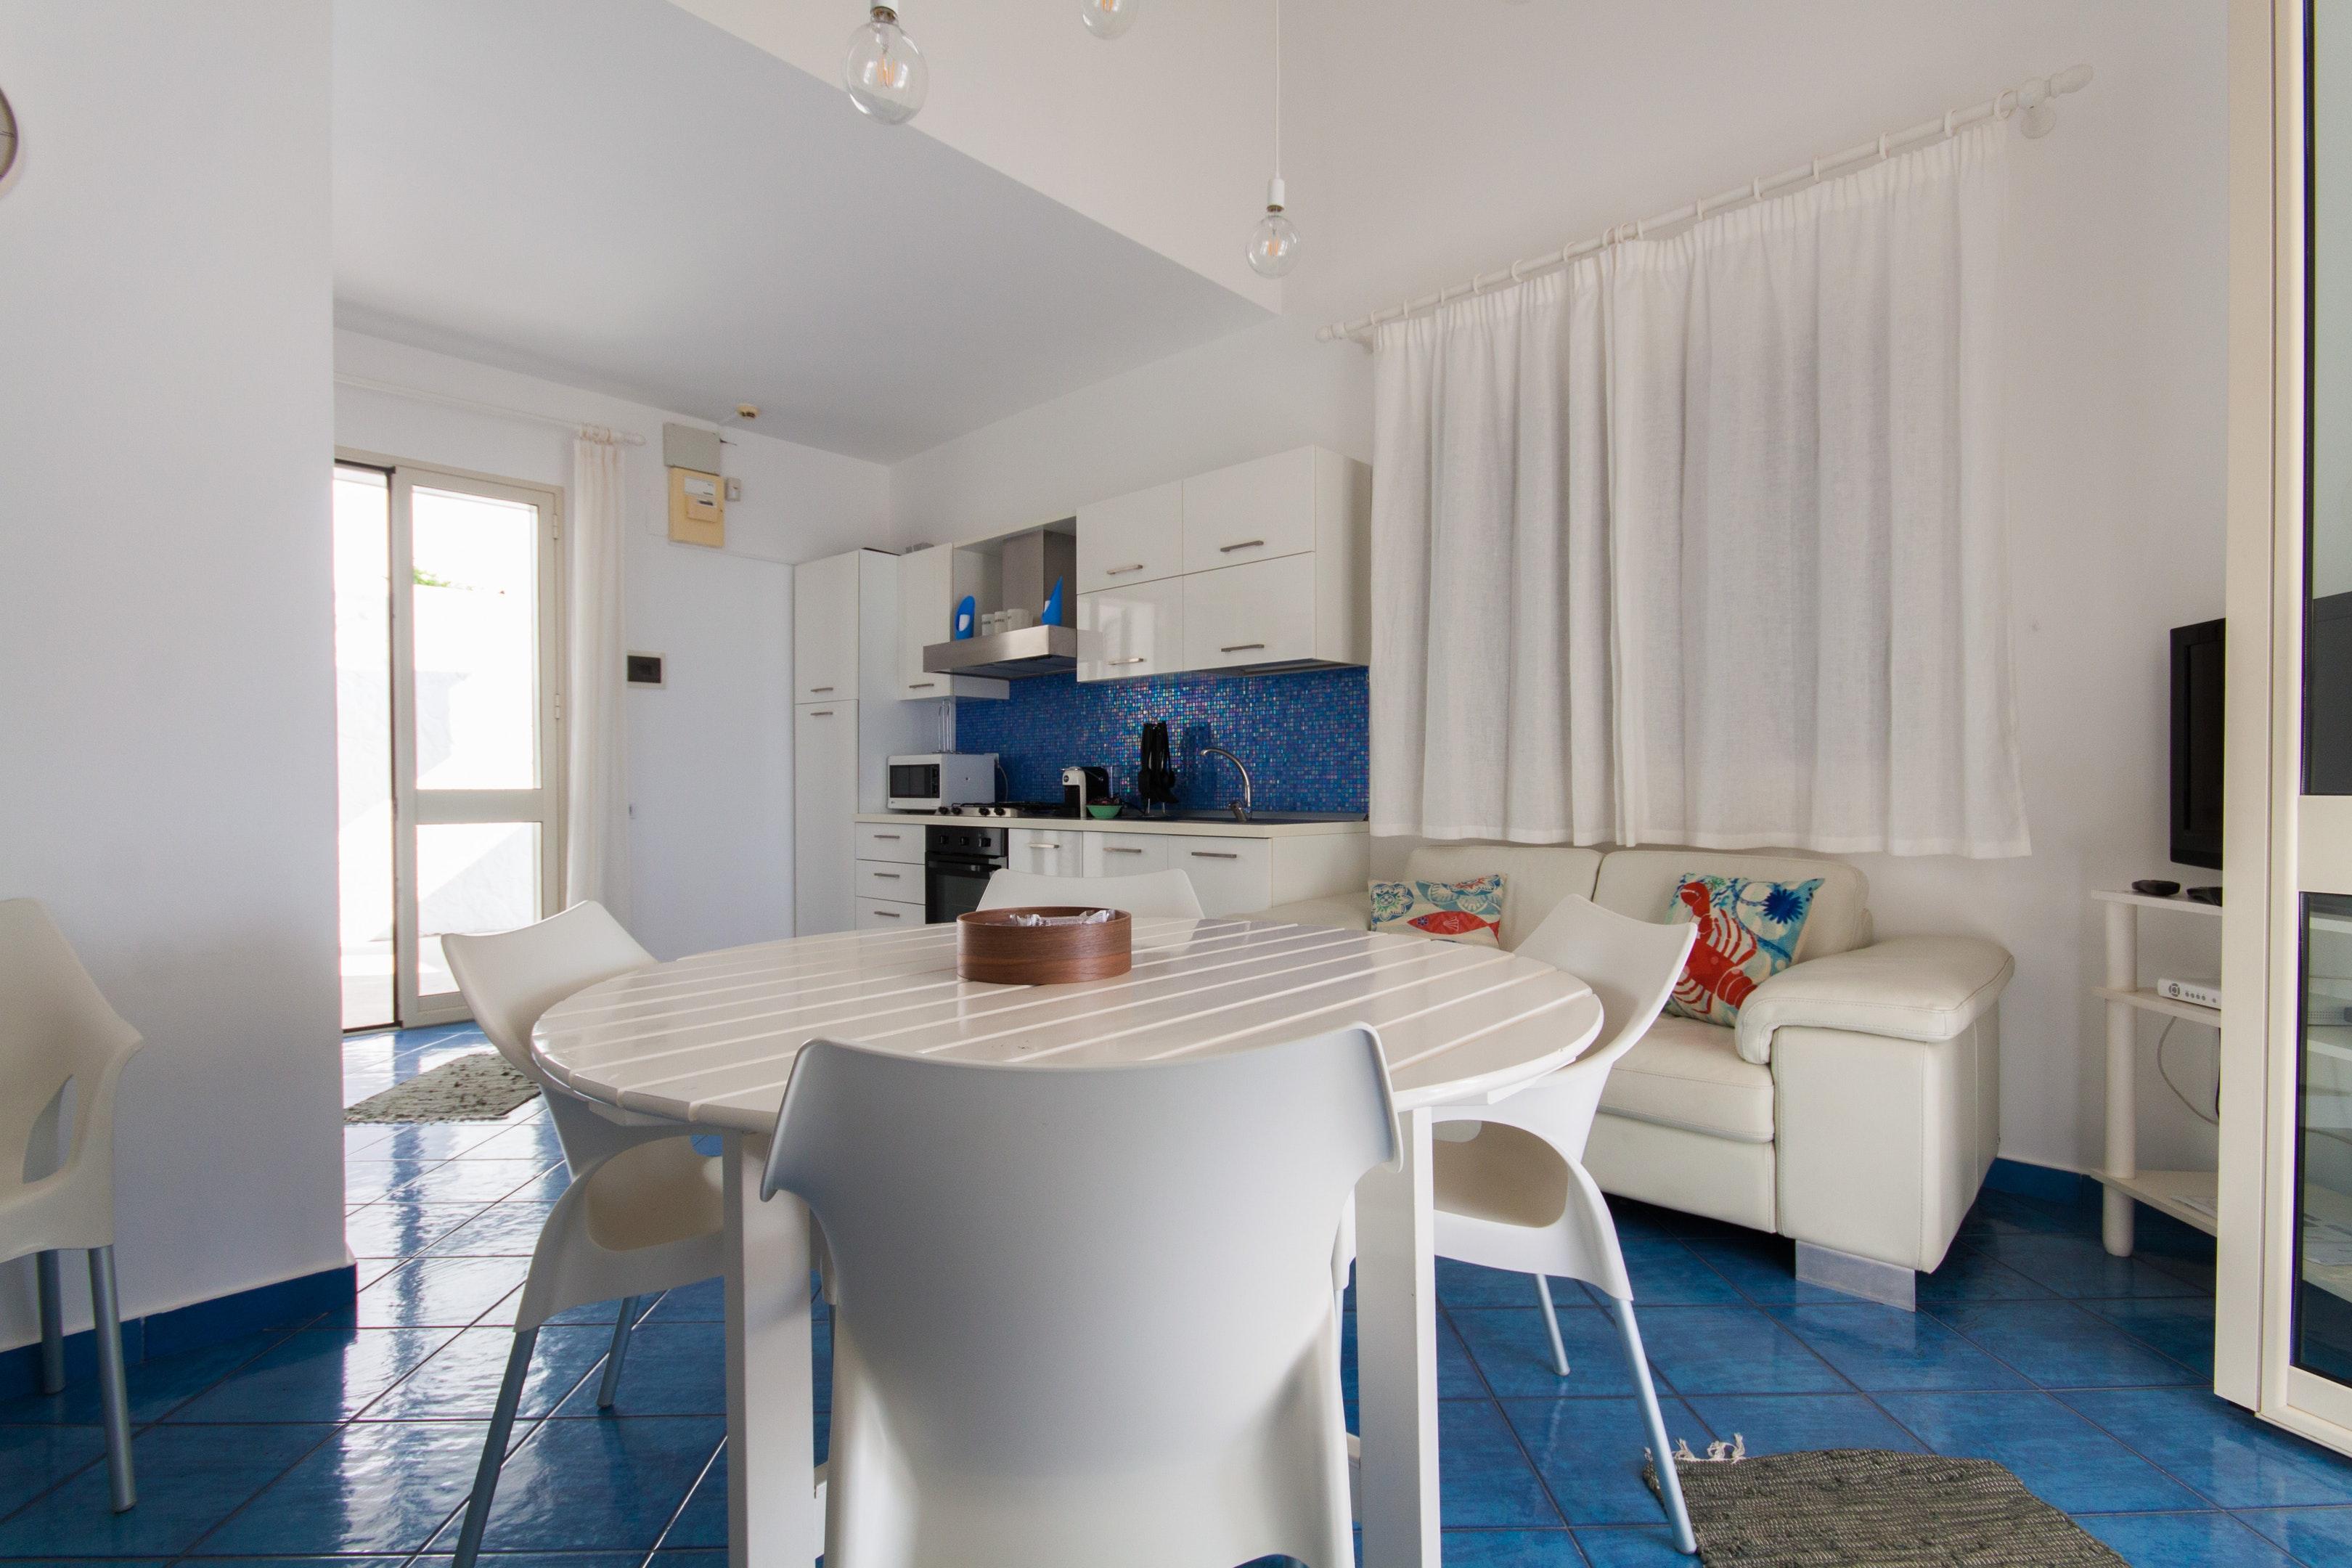 Holiday apartment Wohnung mit 3 Schlafzimmern in Piano di Trappeto mit herrlichem Meerblick, möblierter Terr (2271436), Balestrate, Palermo, Sicily, Italy, picture 11